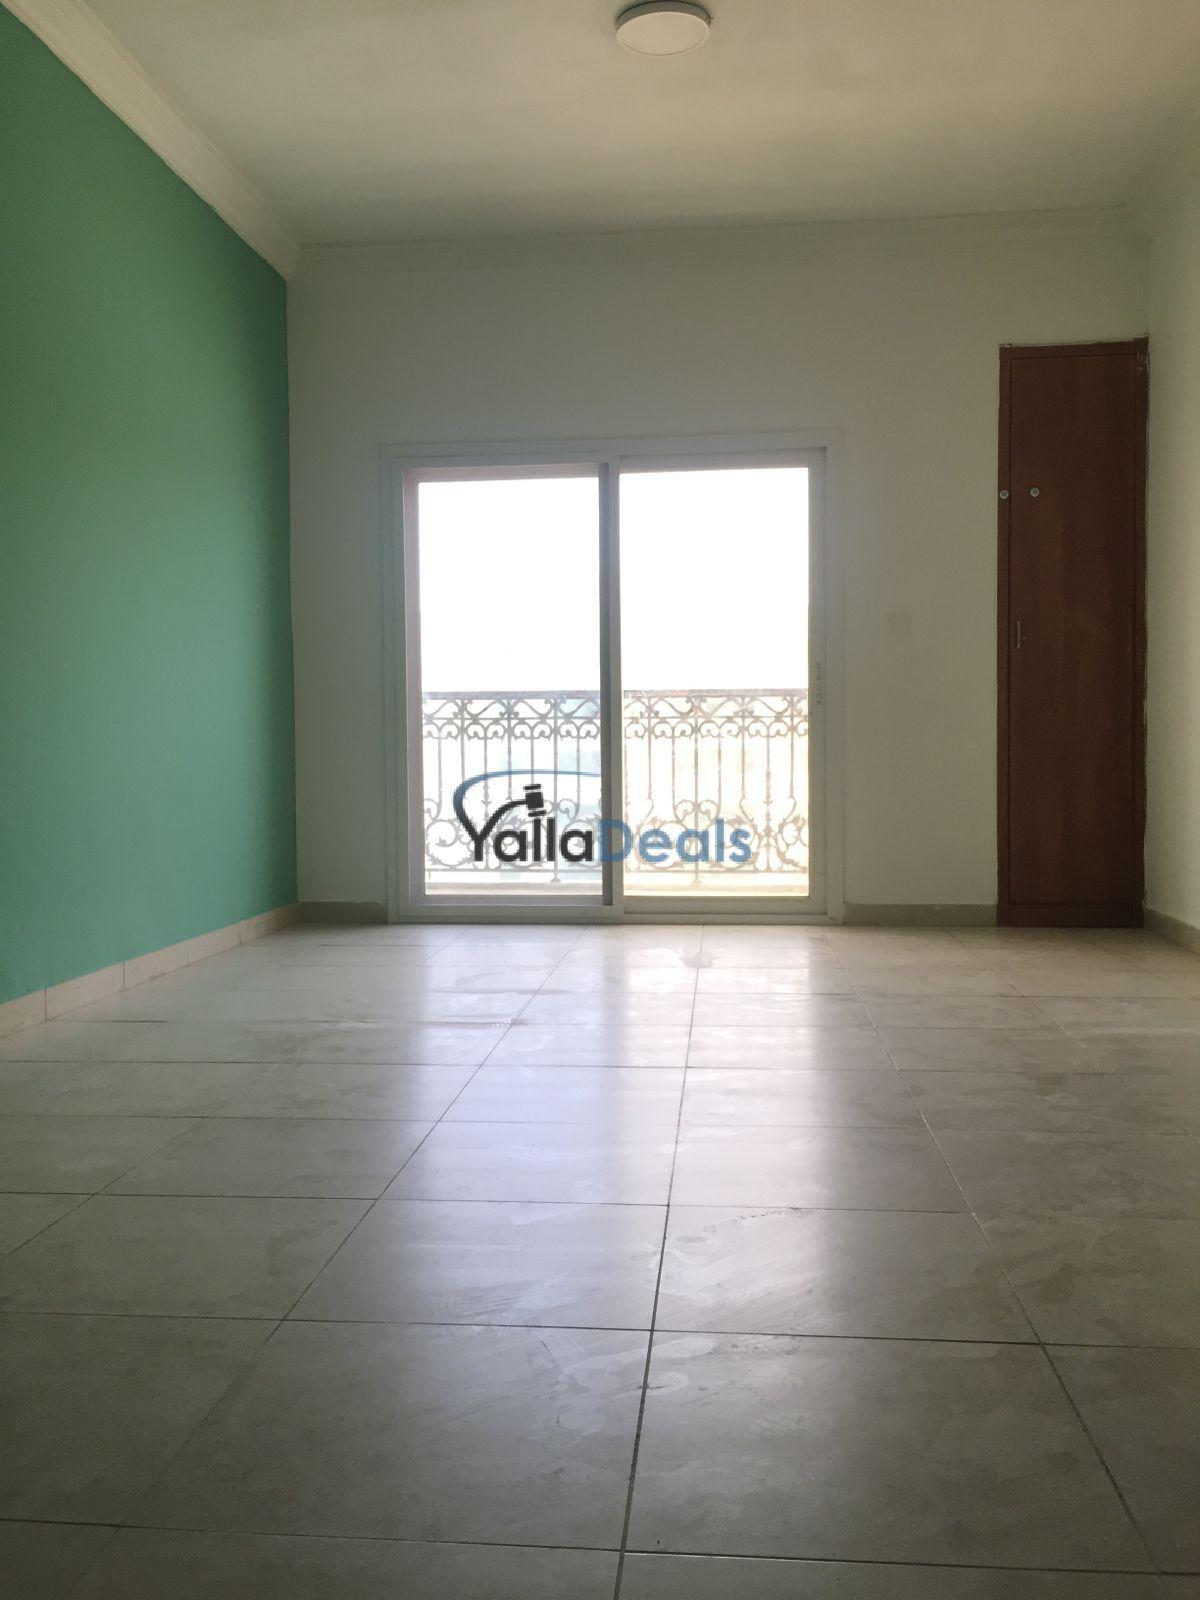 Apartments for Rent in Abu Shagara, Al Sharjah